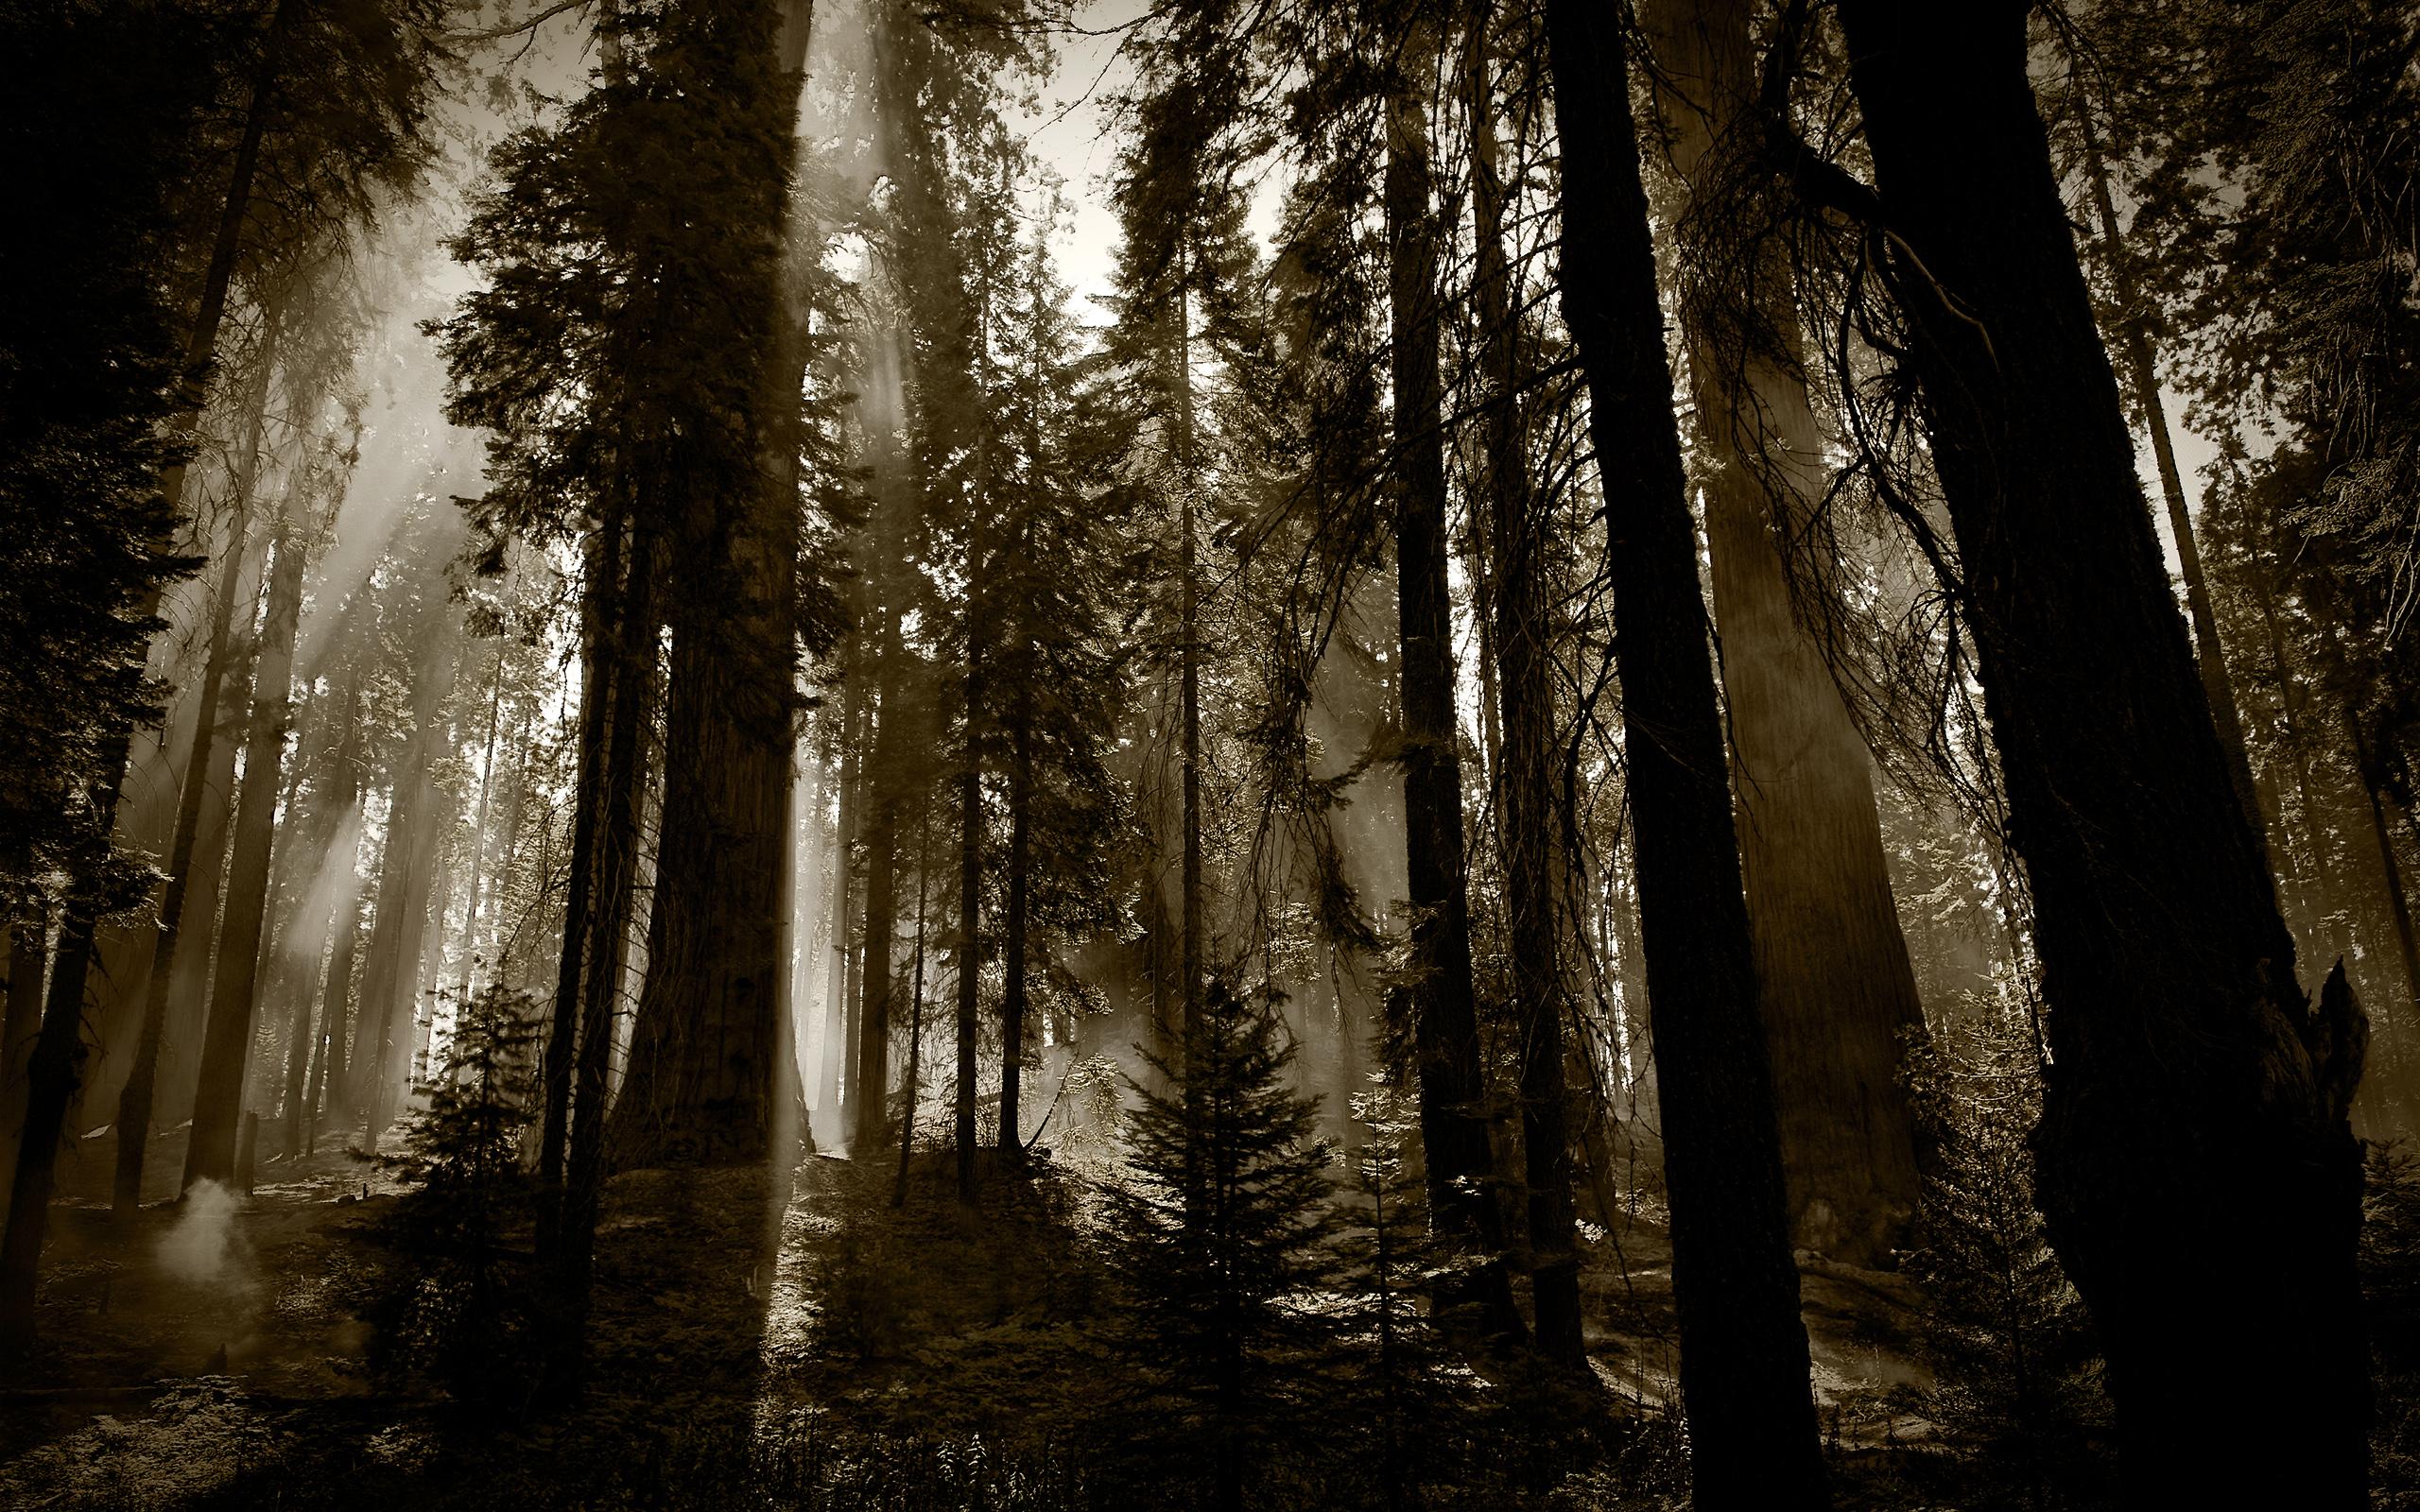 4k wallpaper nature redwoods - photo #1